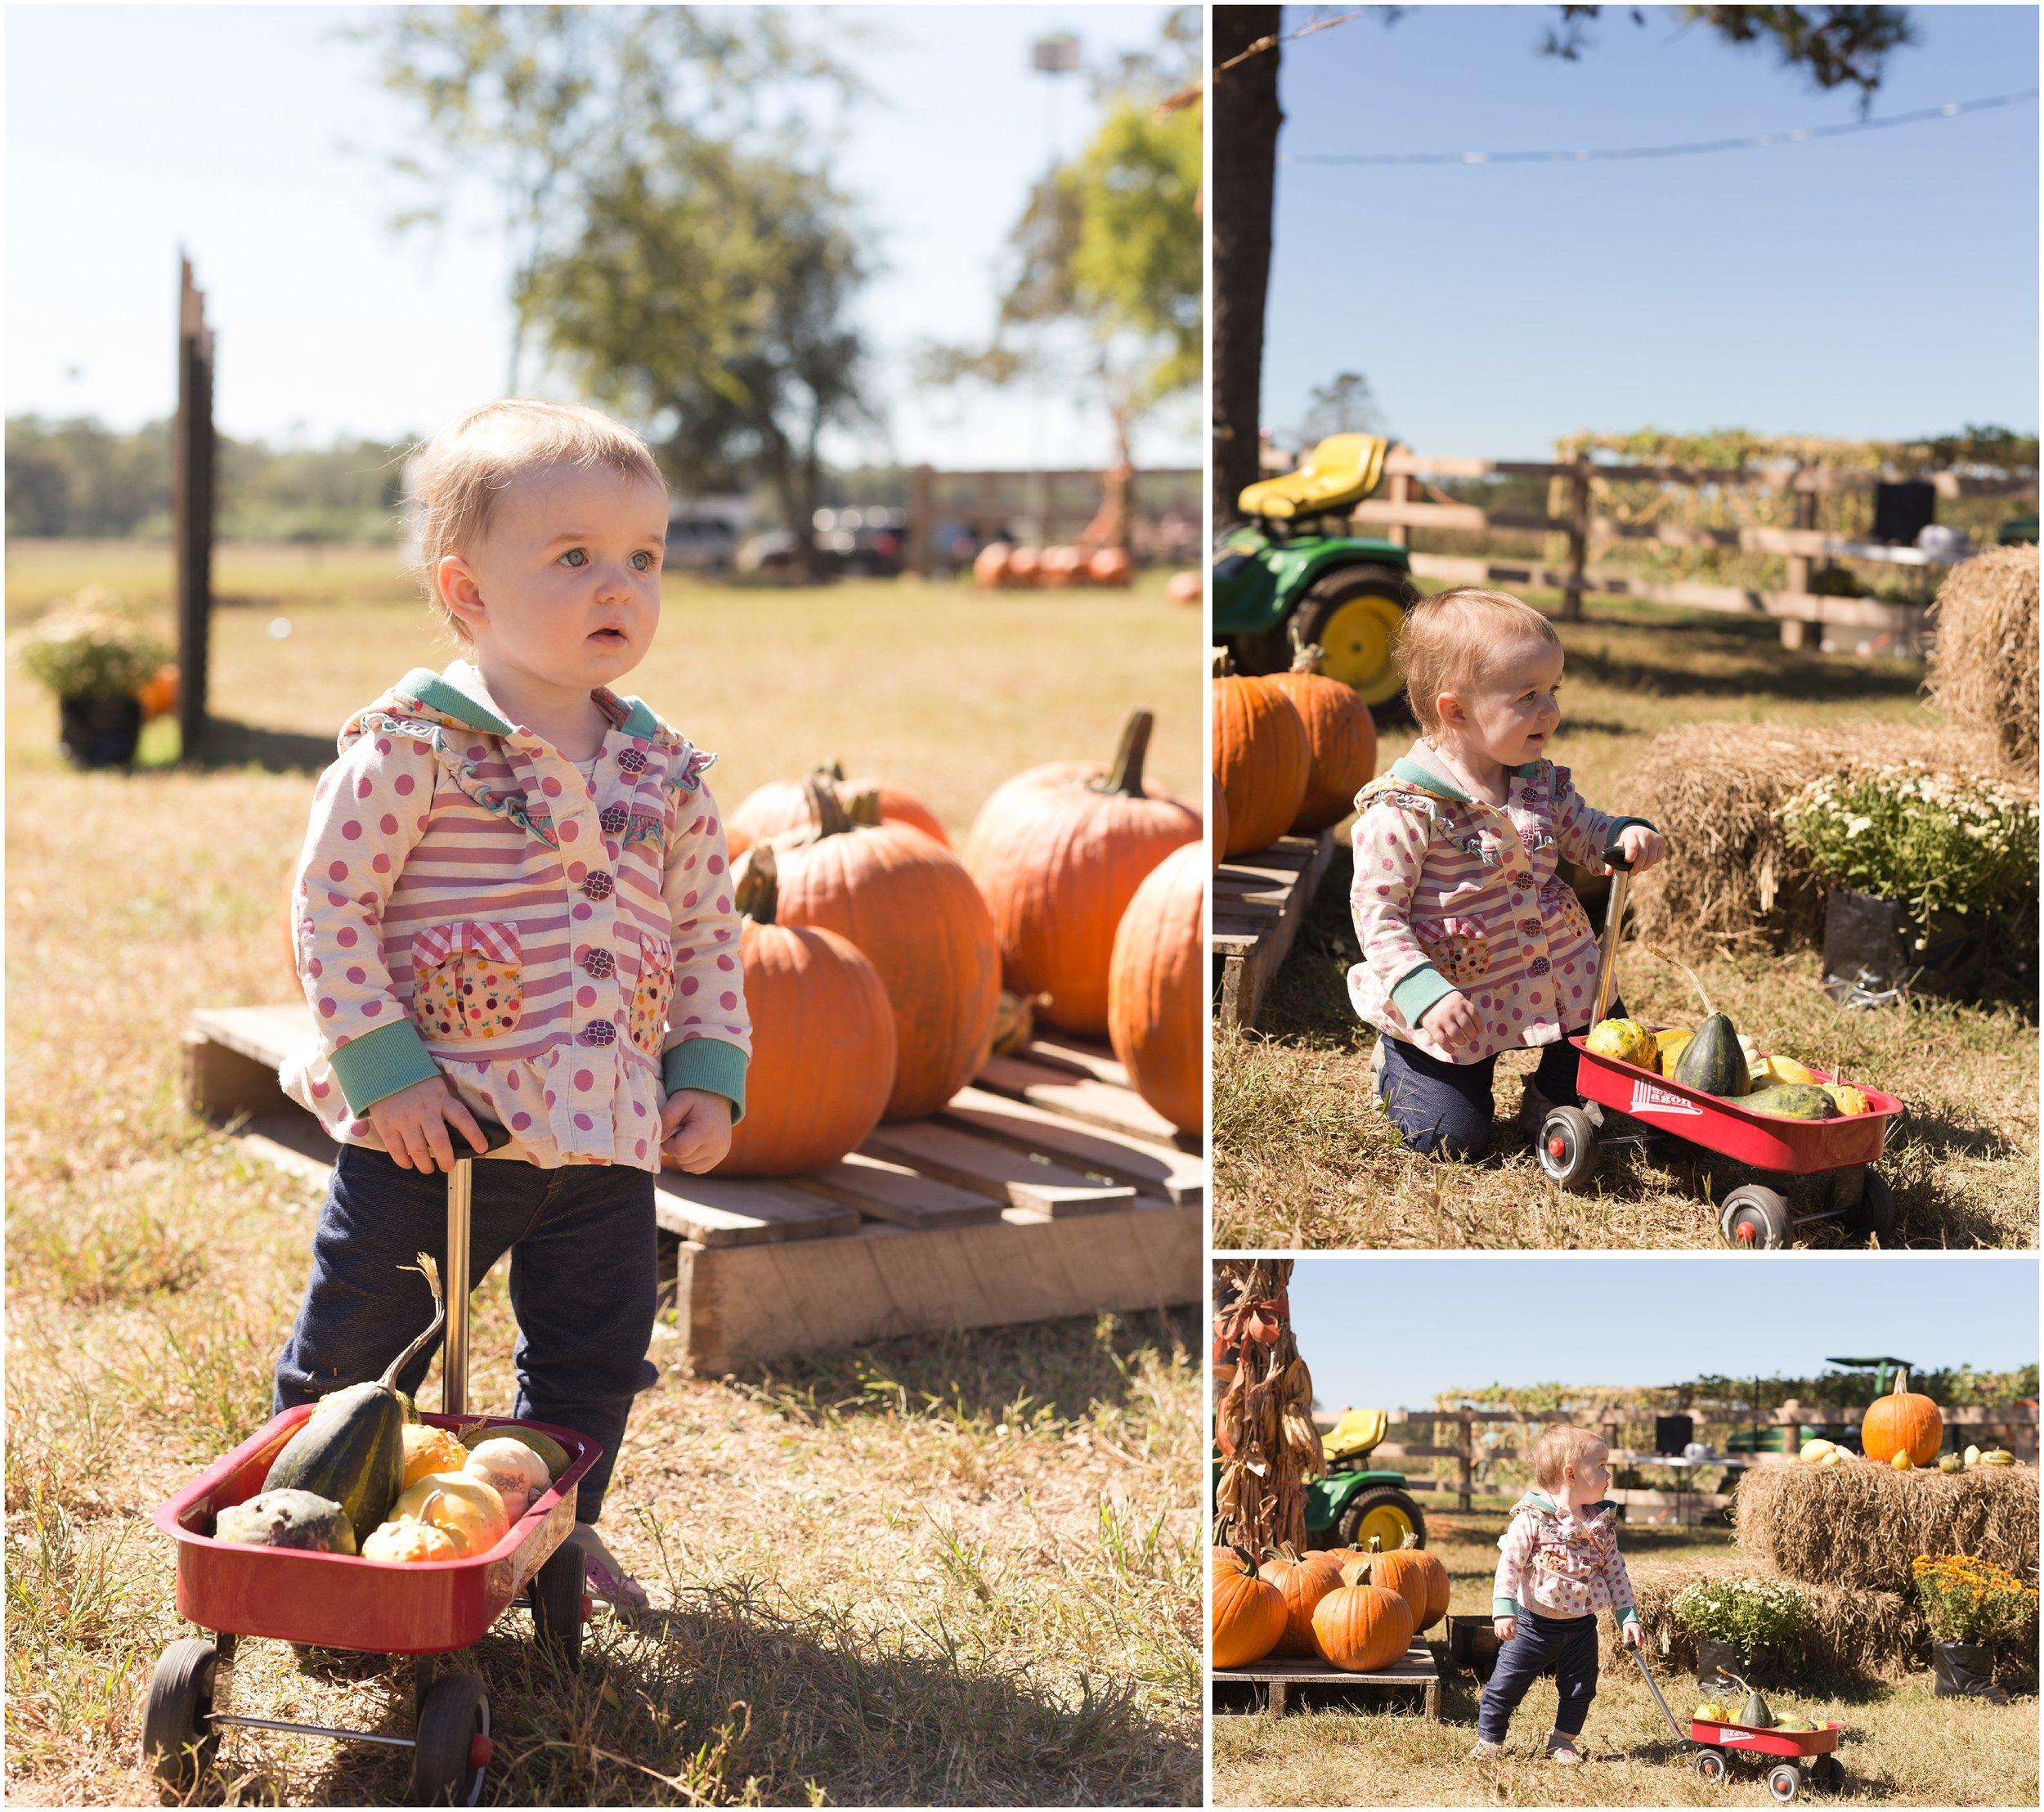 wagon at pumpkin patch